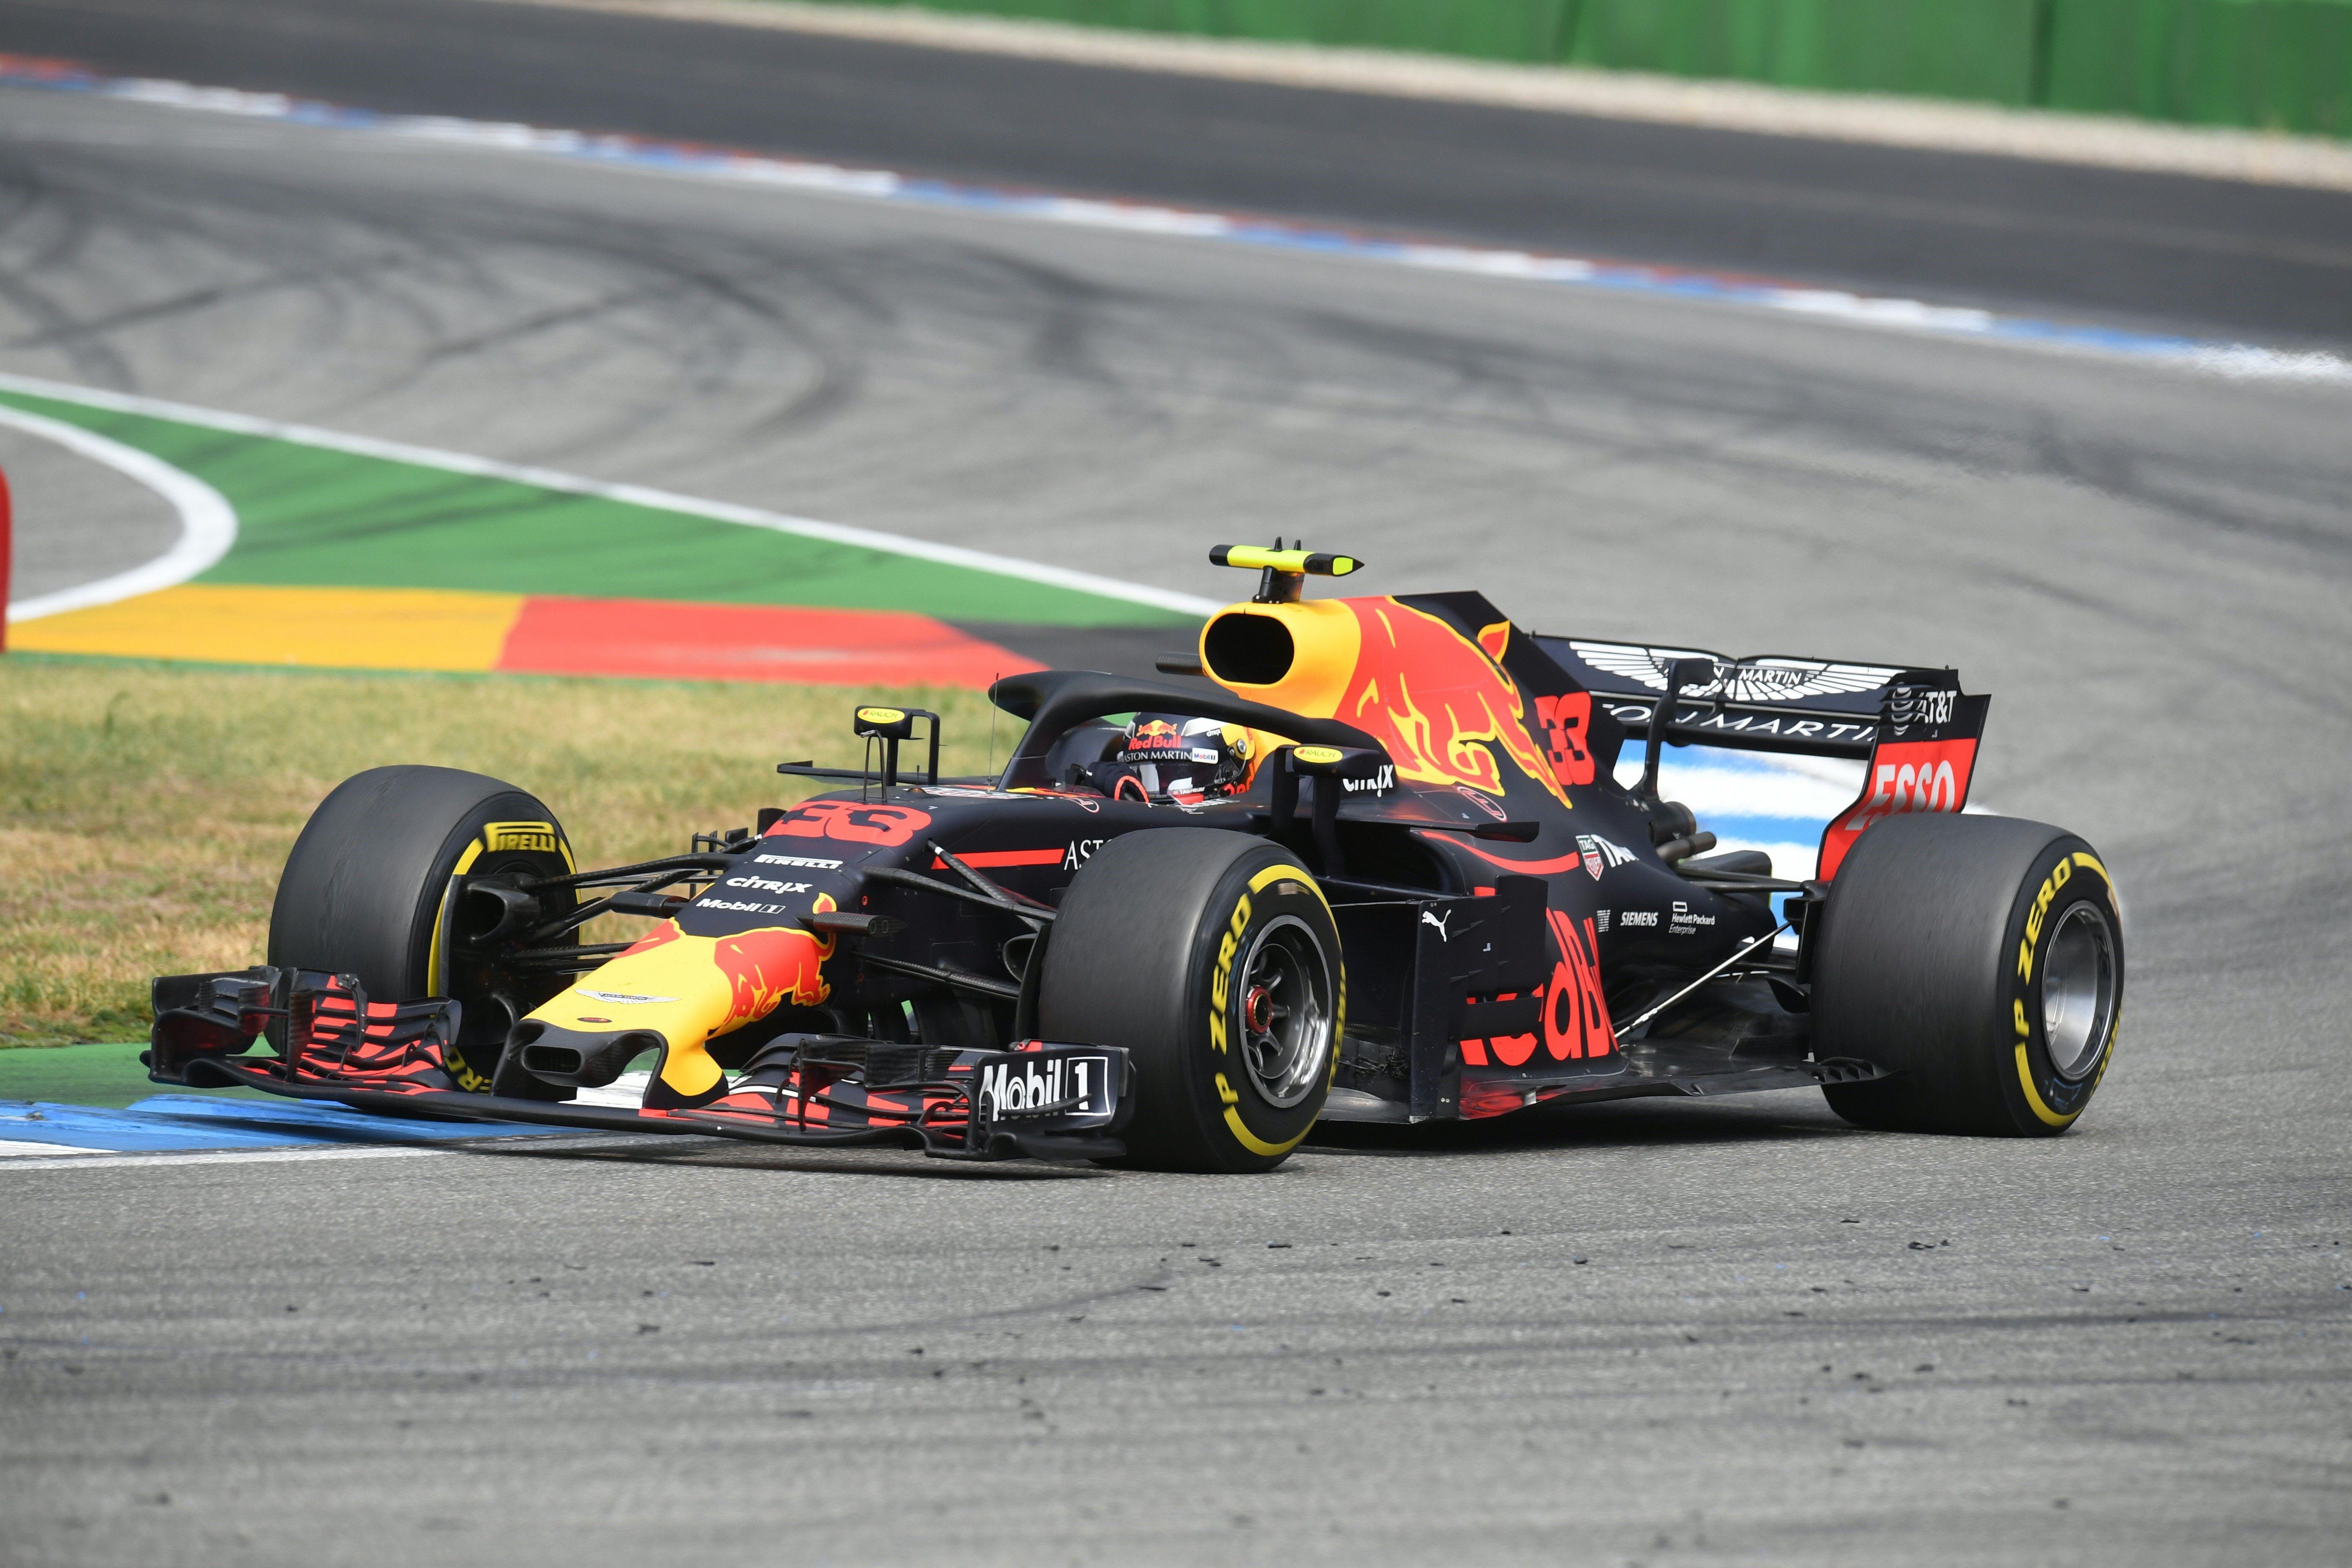 Max Verstappen lors du Grand Prix d'Allemagne 2018